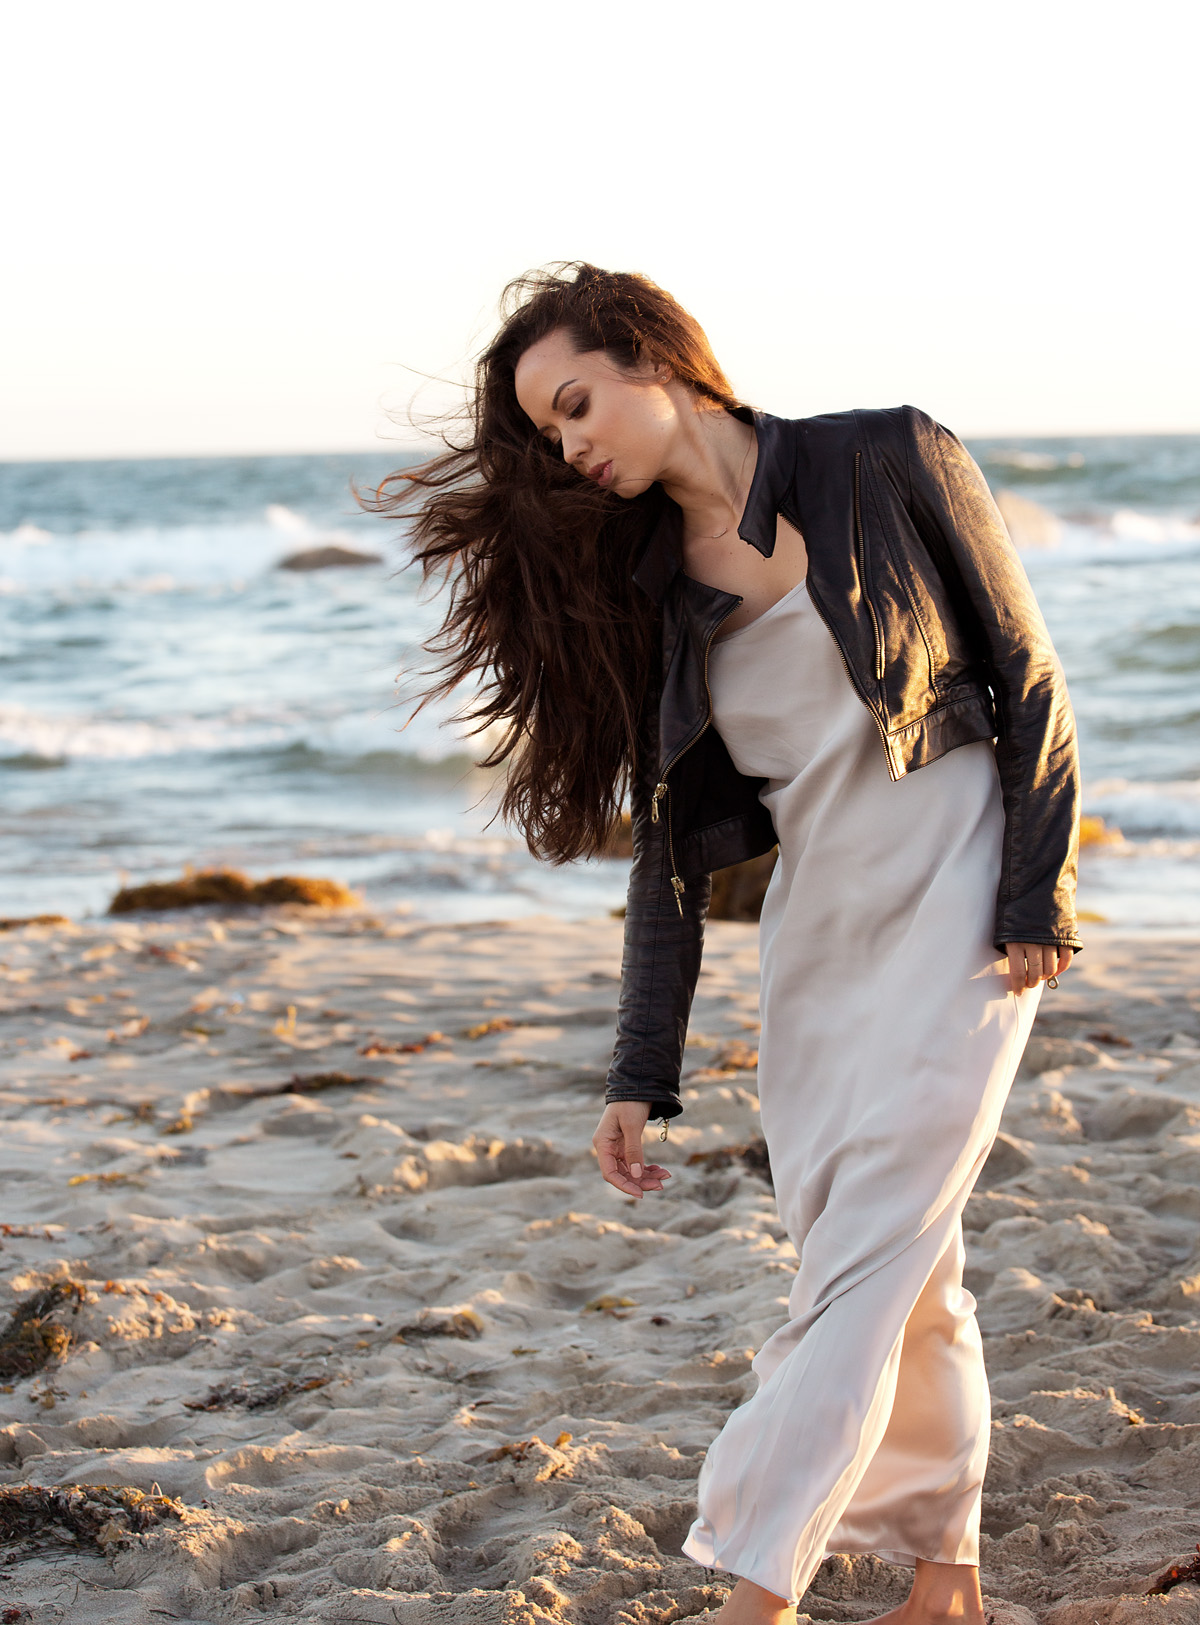 fashion blog, venice beach, los angeles, la model, ballerina, dancer, michelle mason, leather jacket, alexander wang dress, sunset